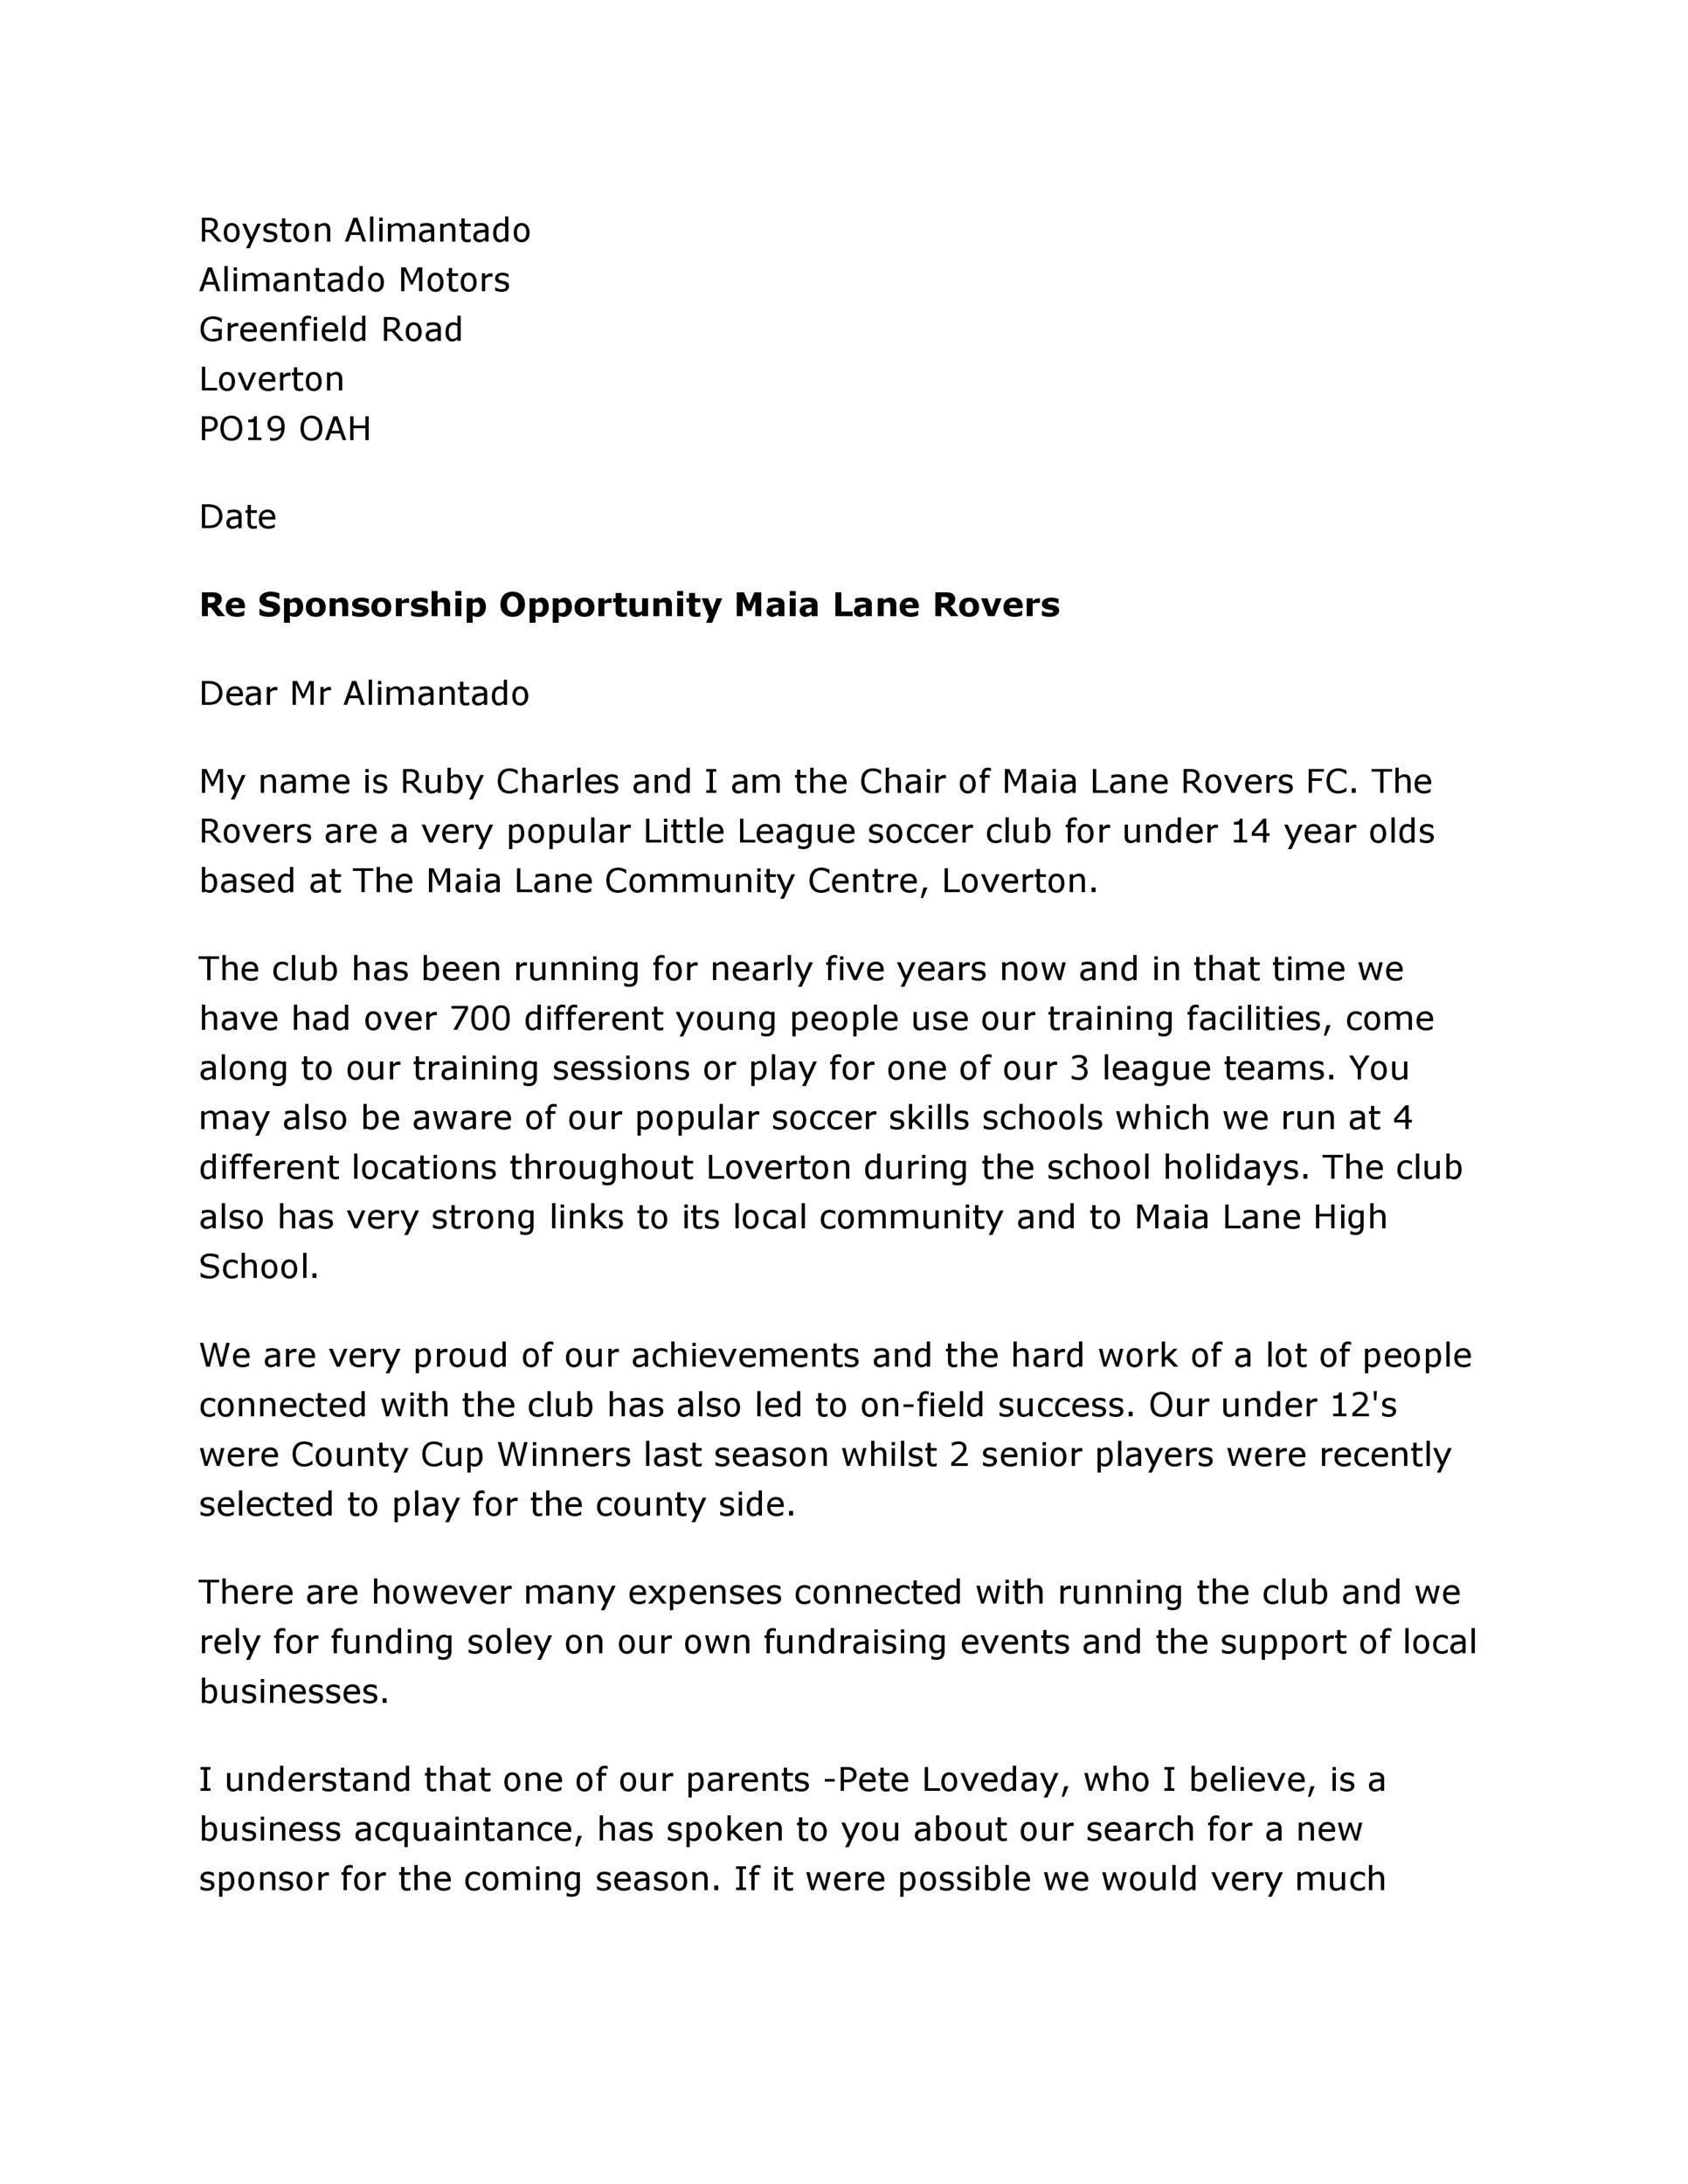 40+ Sponsorship Letter & Sponsorship Proposal Templates